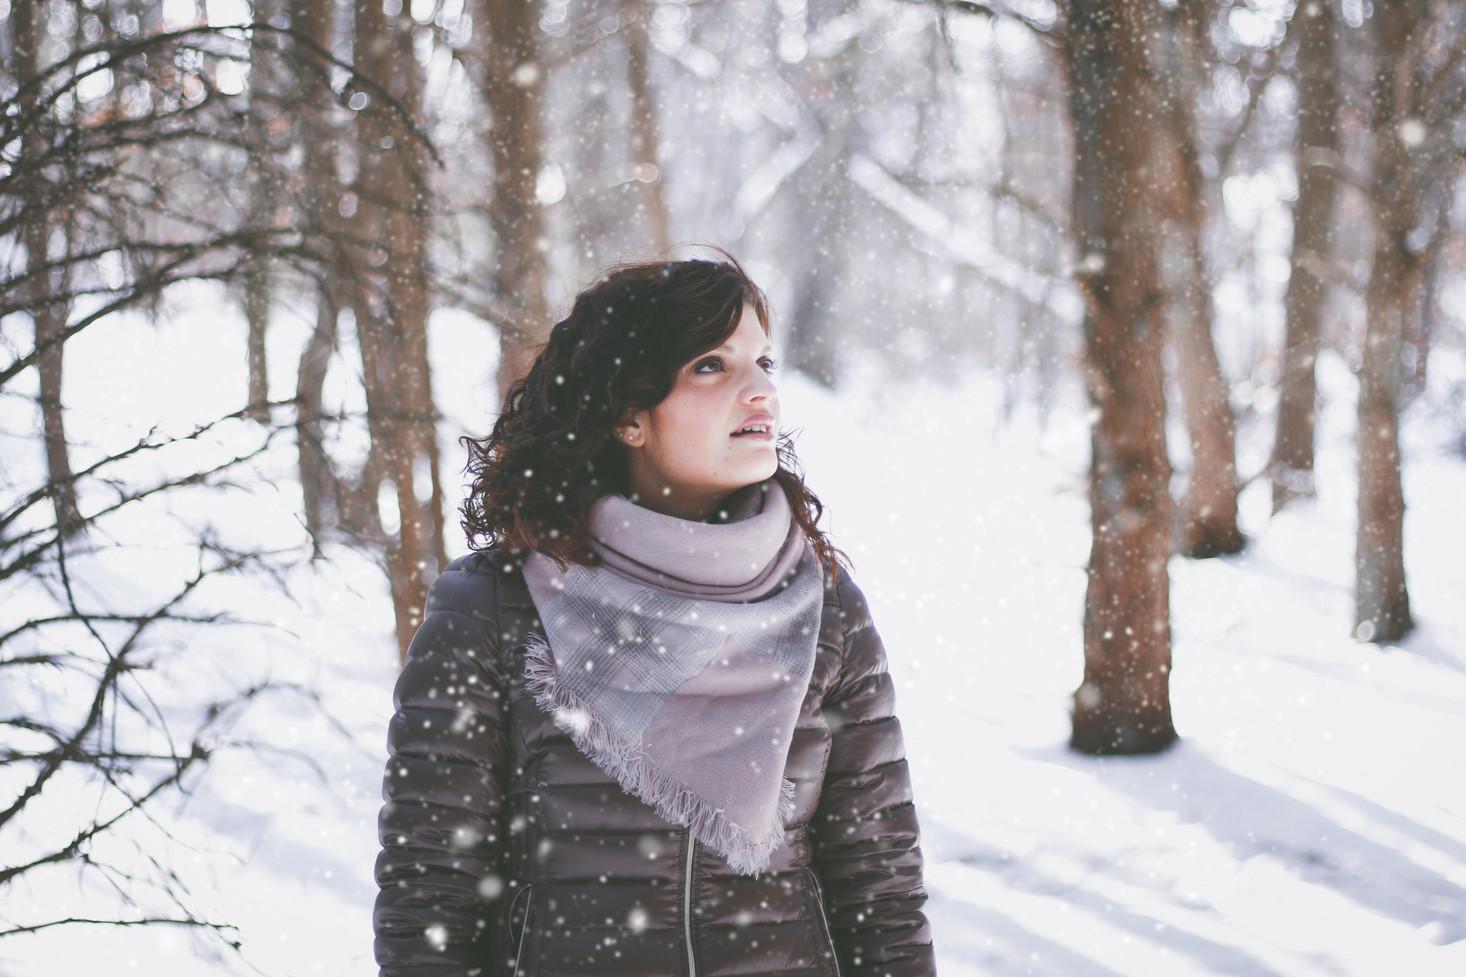 chet_winter-11 copy.jpg